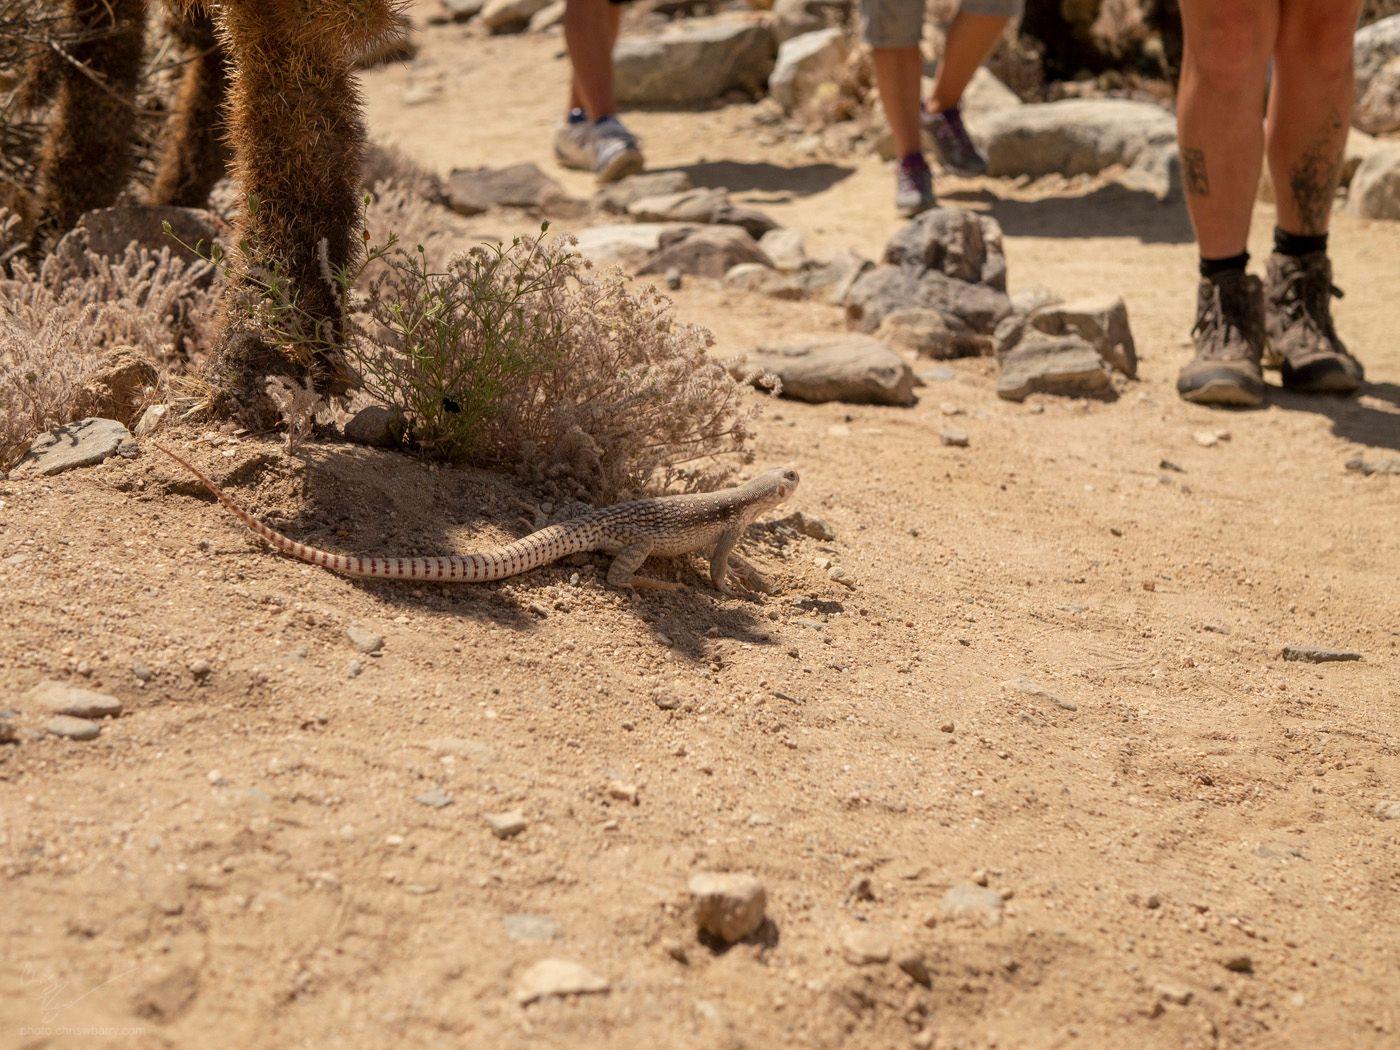 4-28-19: Desert Iguana